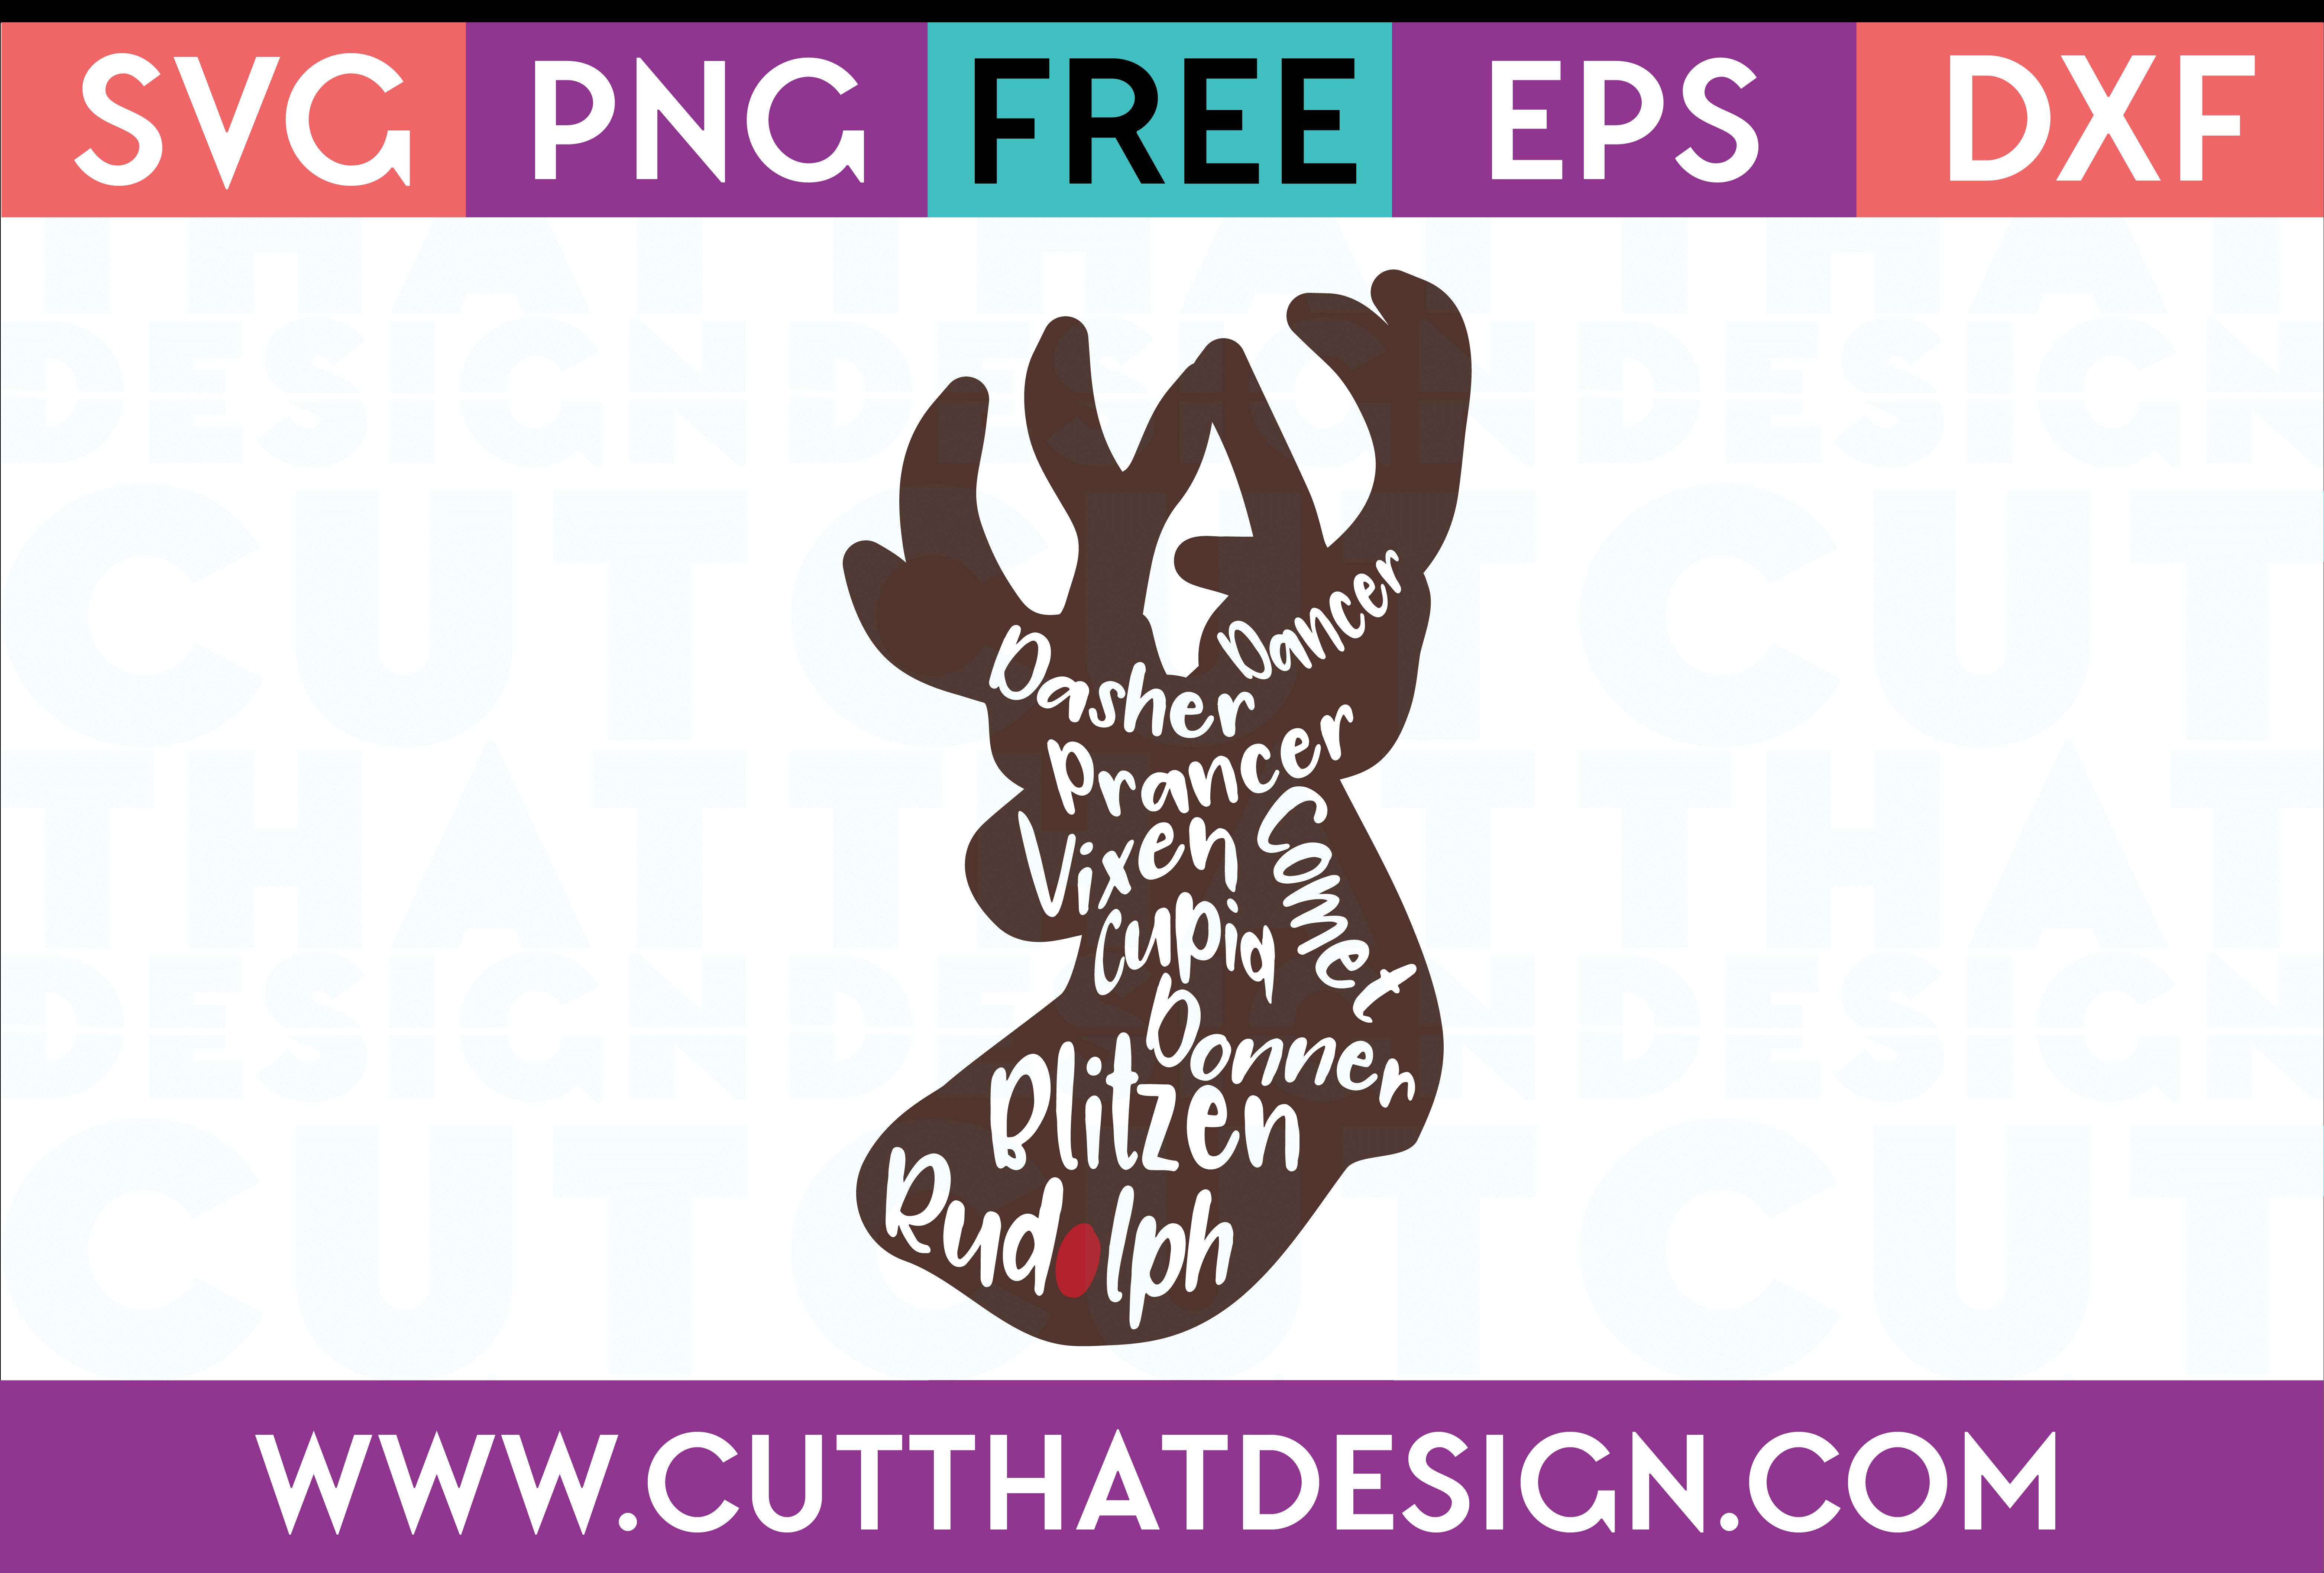 Free SVG Files Reindeer names, Christmas svg, Free